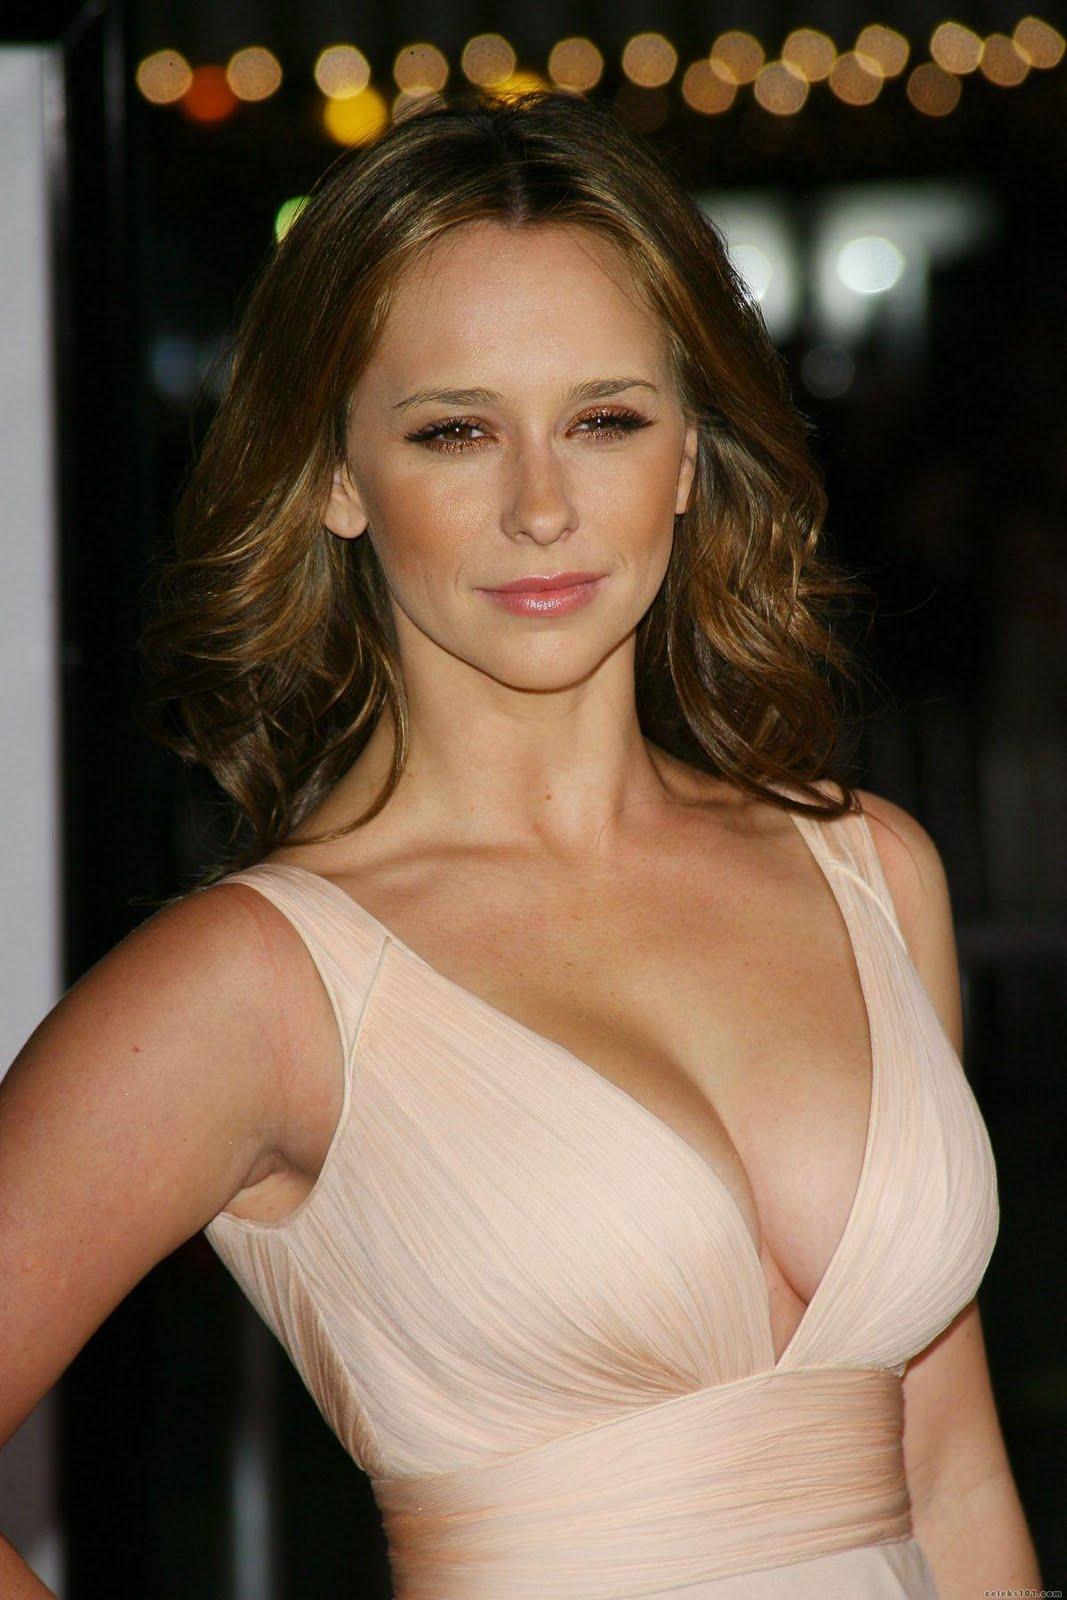 Wallpapers of Jennifer Love Hewitt ~ My Cute Actresses